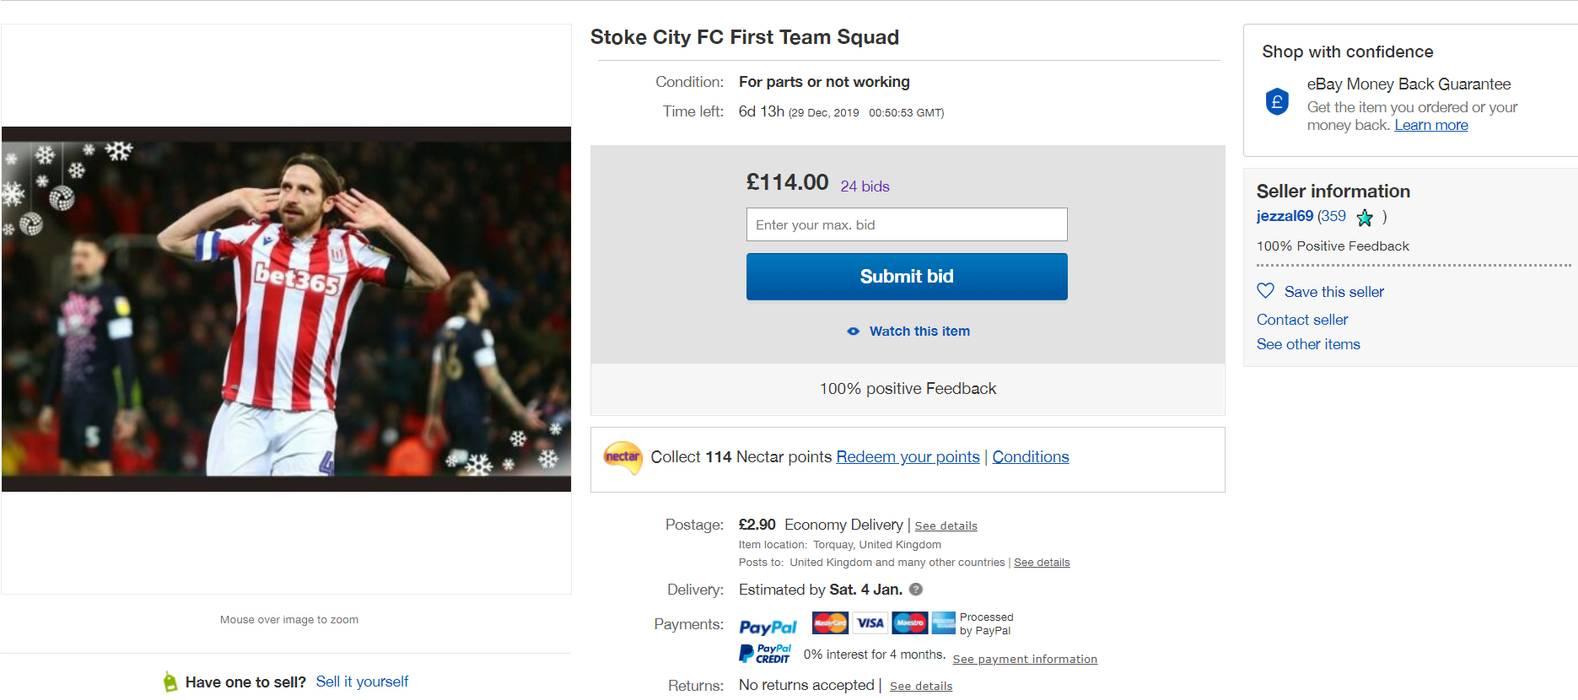 Stoke City vendita su eBay